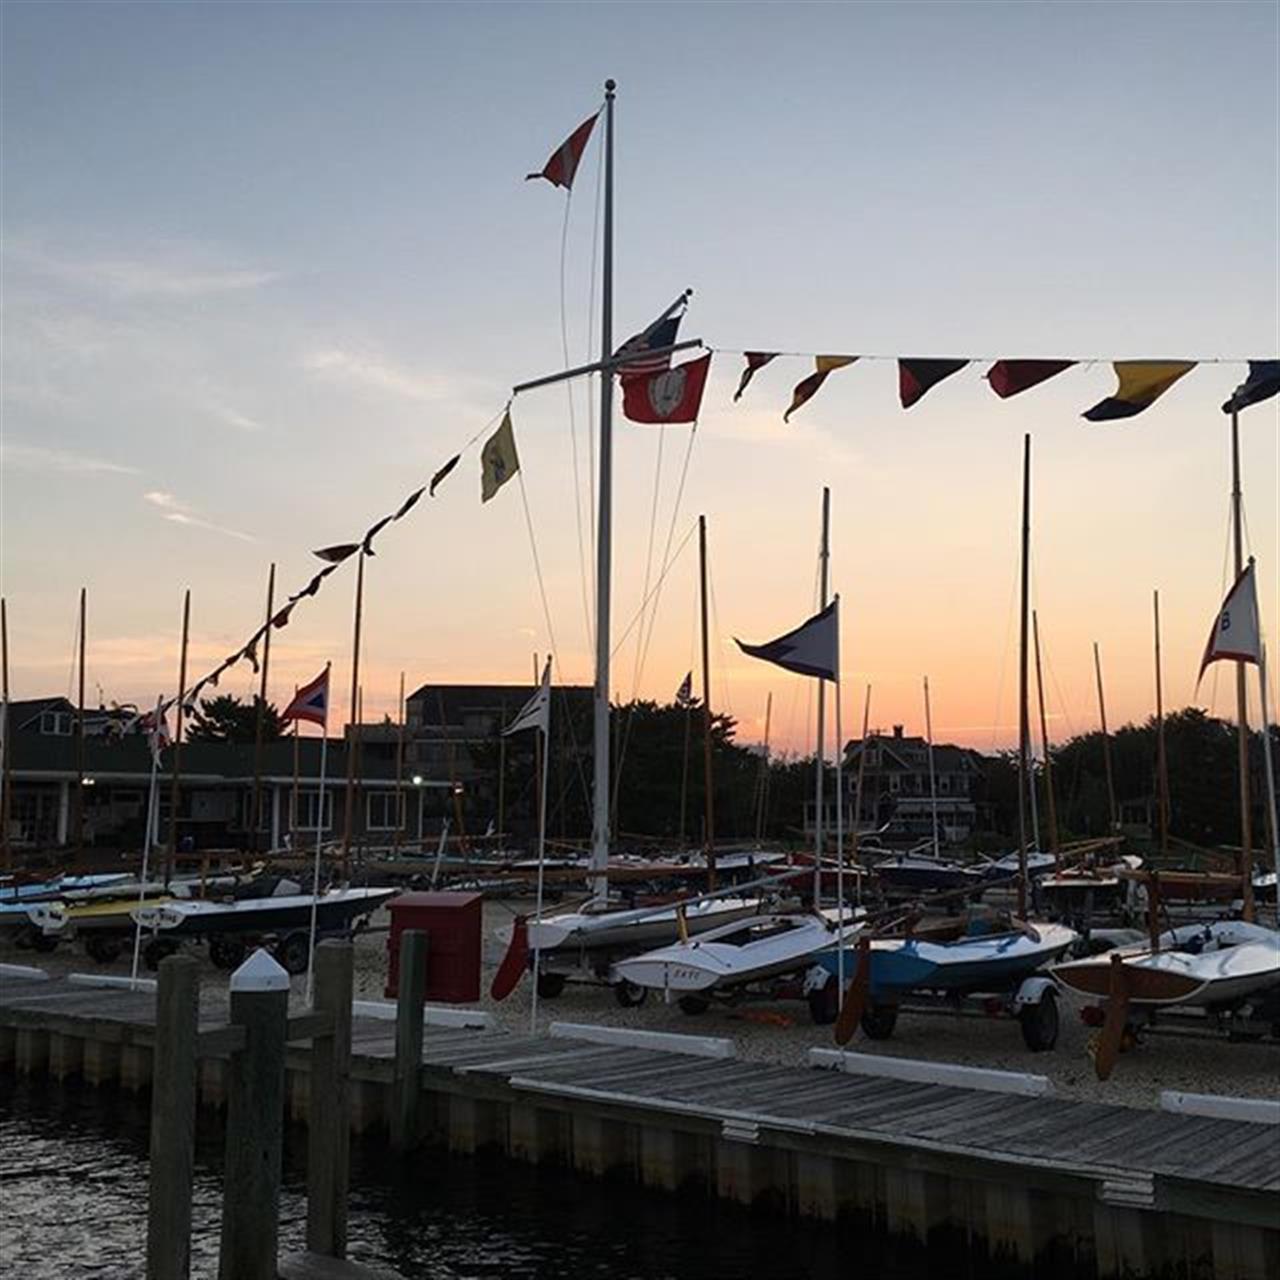 Early morning... #boats #flags #sailing #nj #goodmorning #jshn